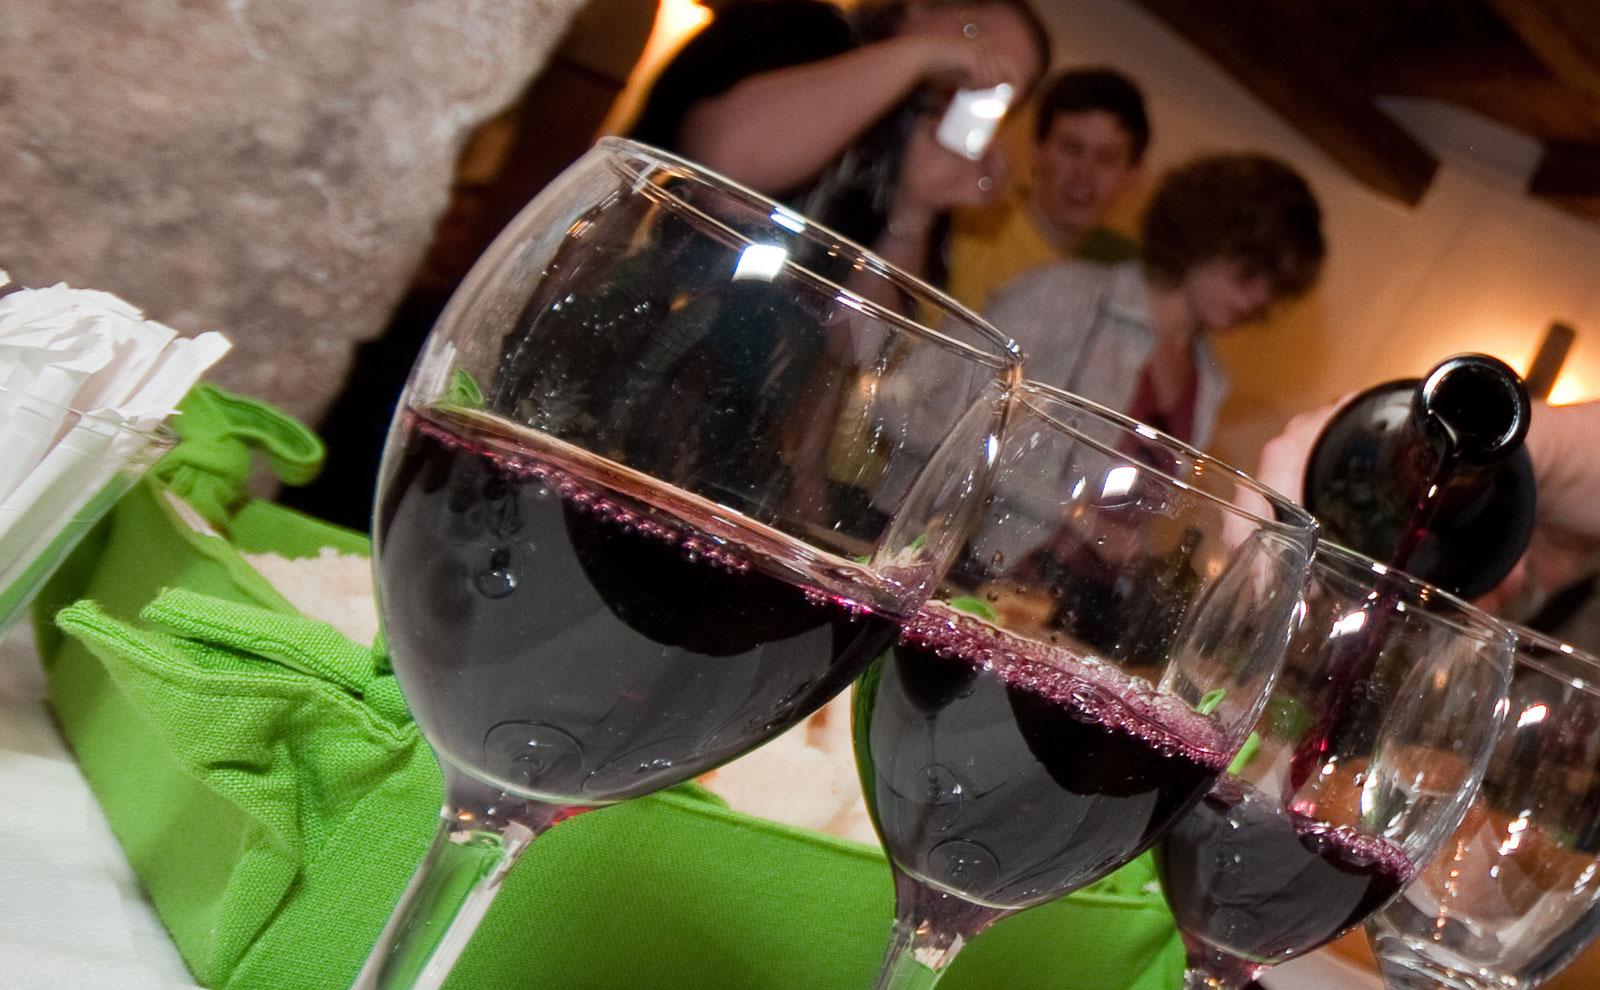 prezentacija i degustacija 3 vrste vina